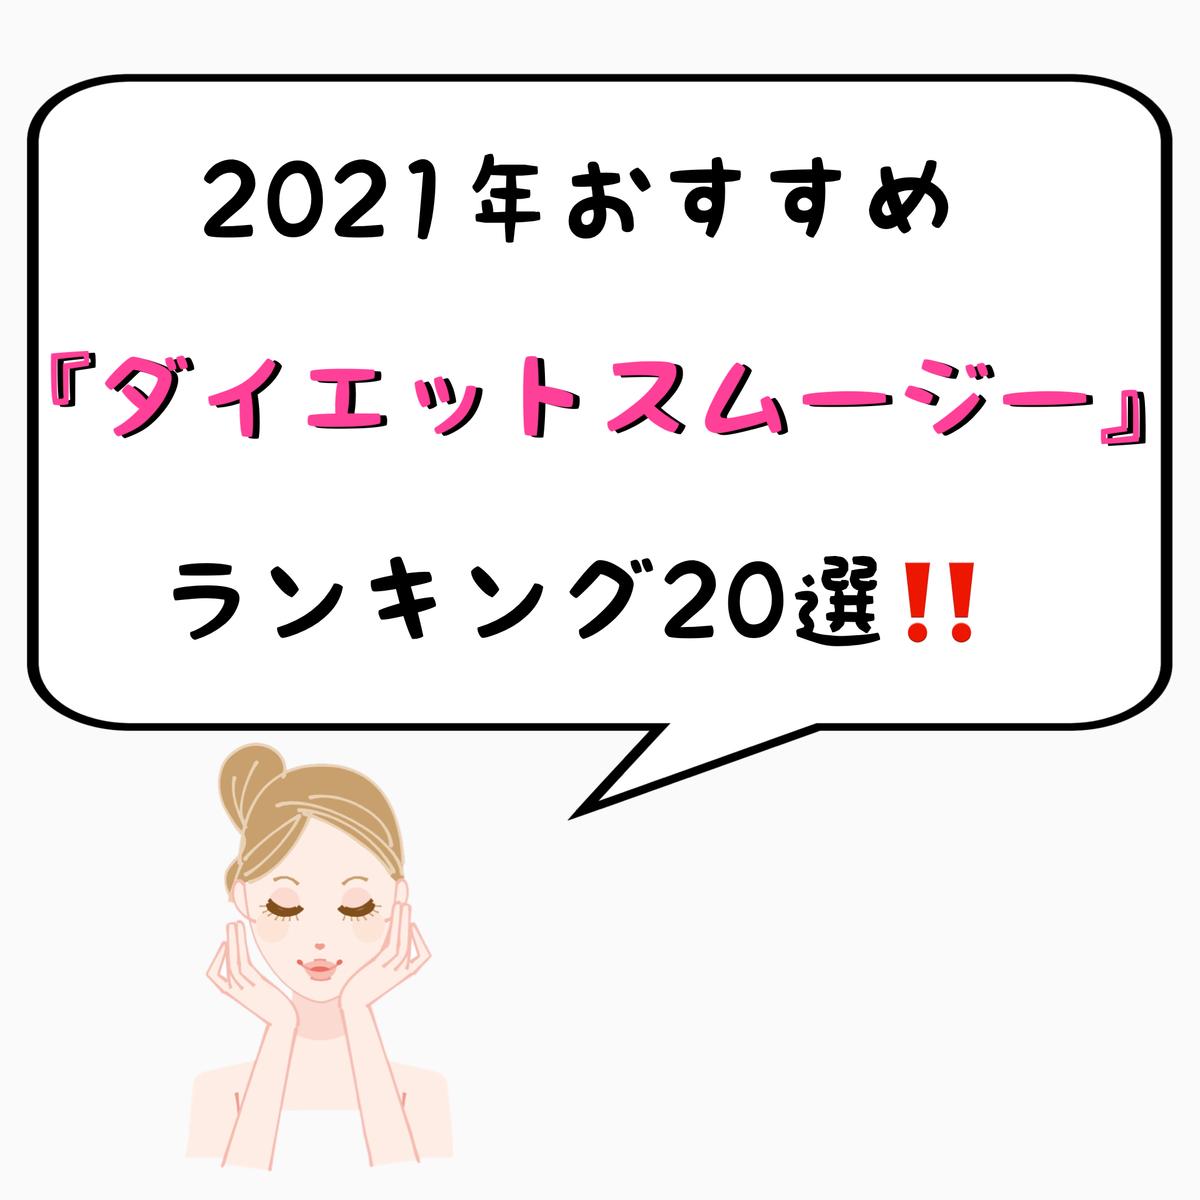 f:id:nokonoko_o:20210124111211j:plain